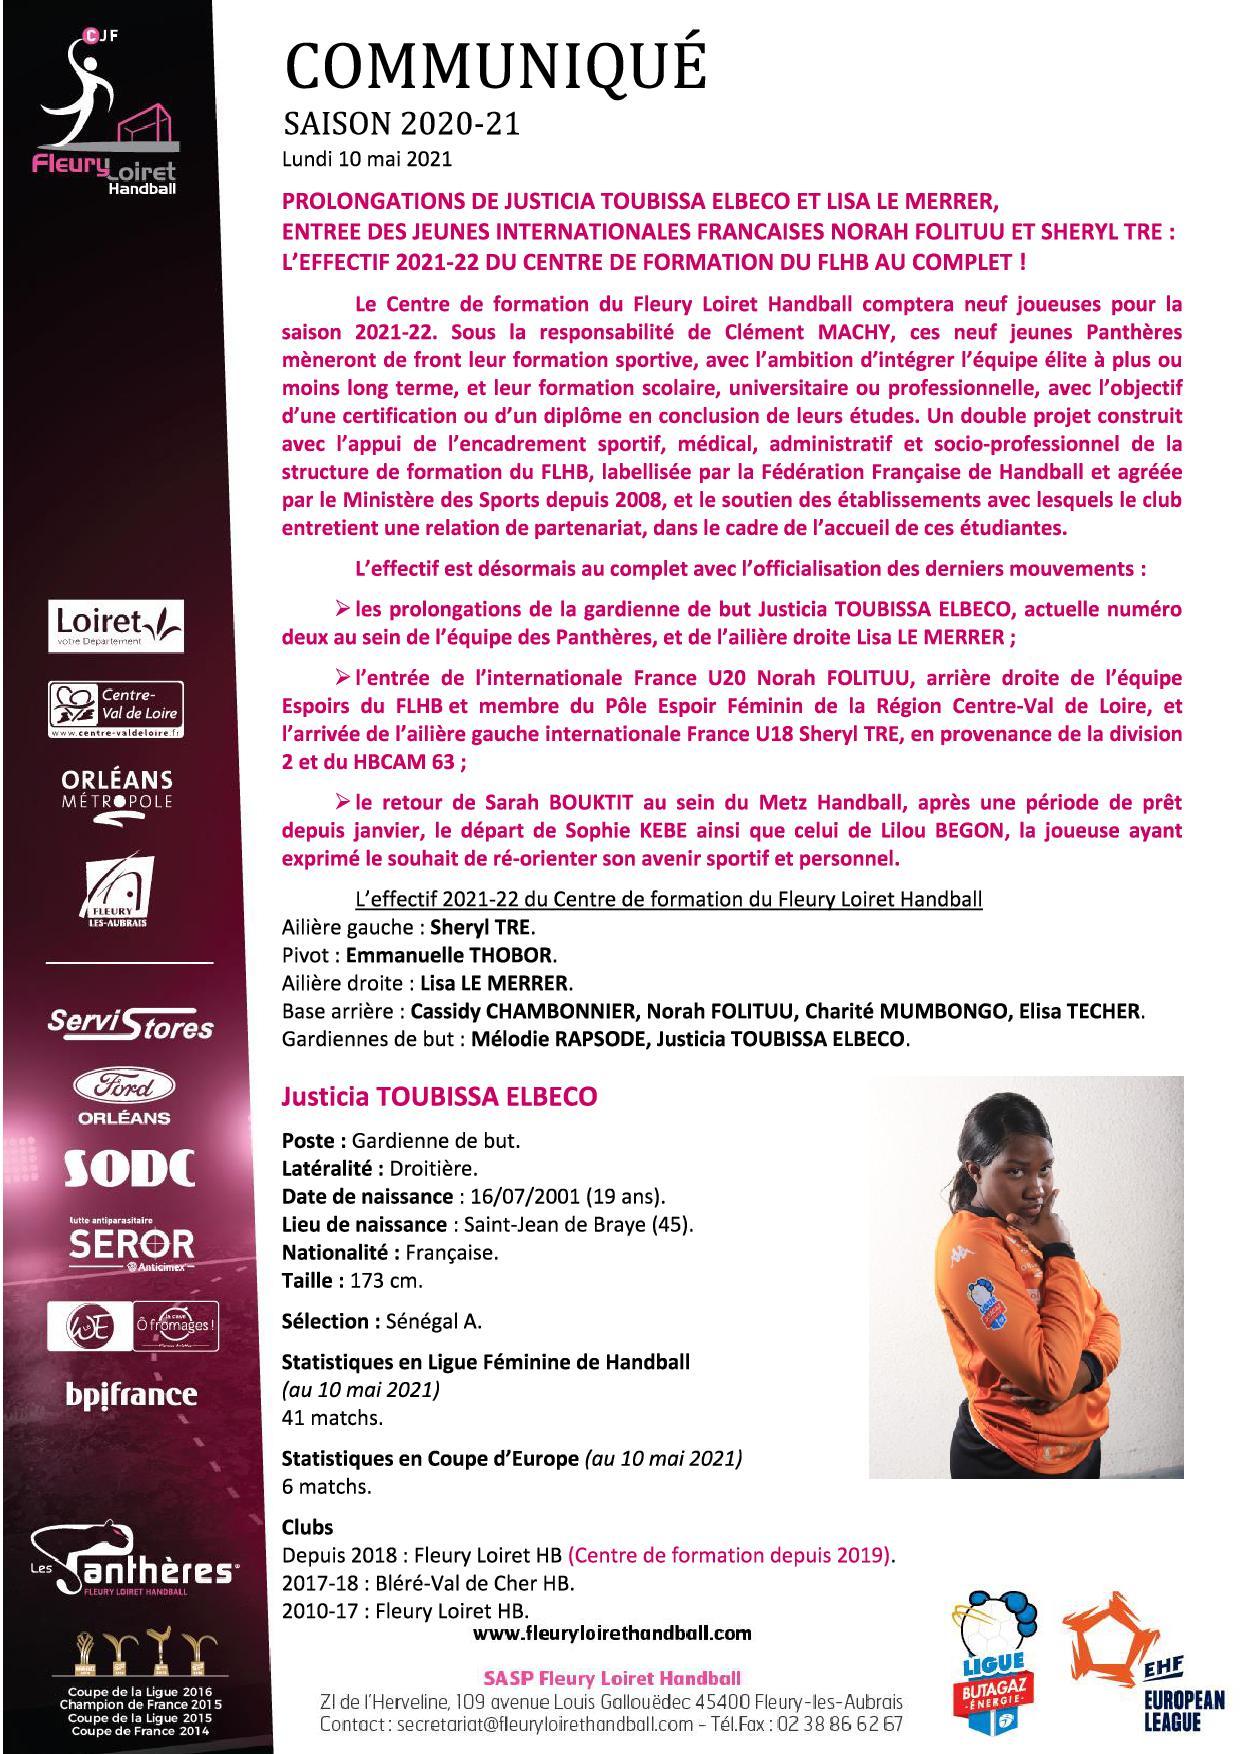 Communiqué Fleury Loiret Handball - Lundi 10 mai 20211.jpg